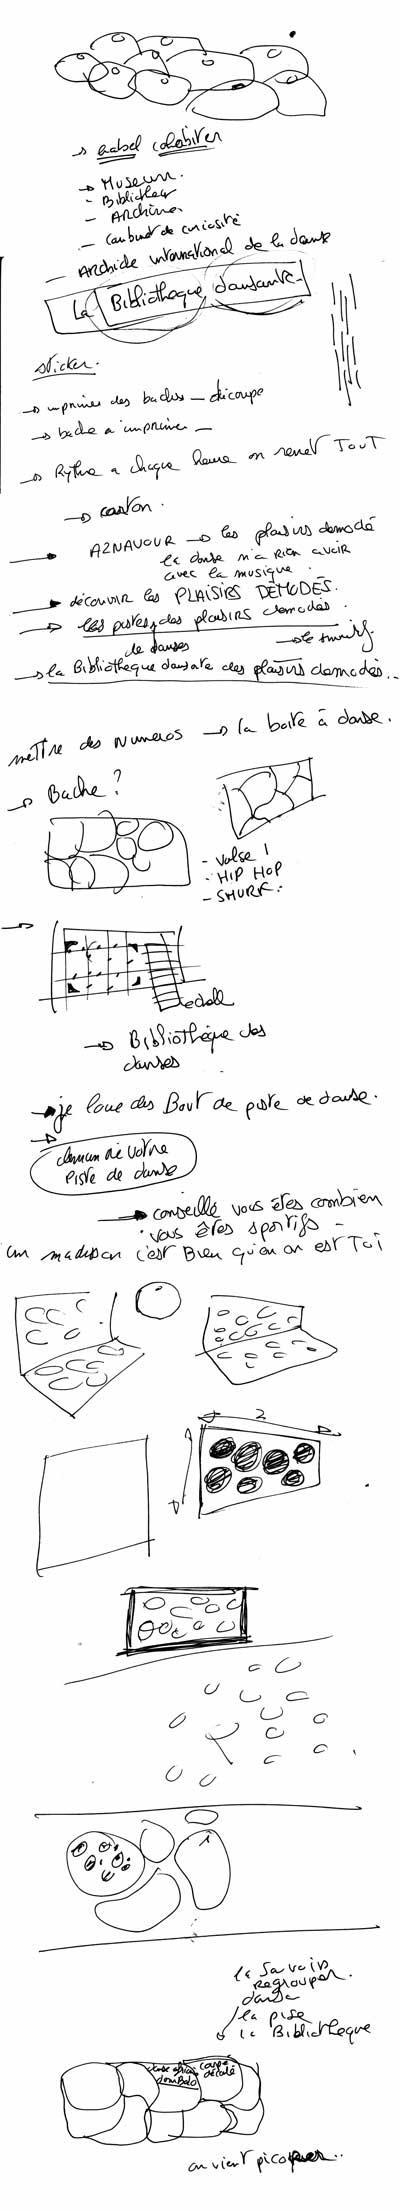 biblio-dansant-dogniaux-17.jpg